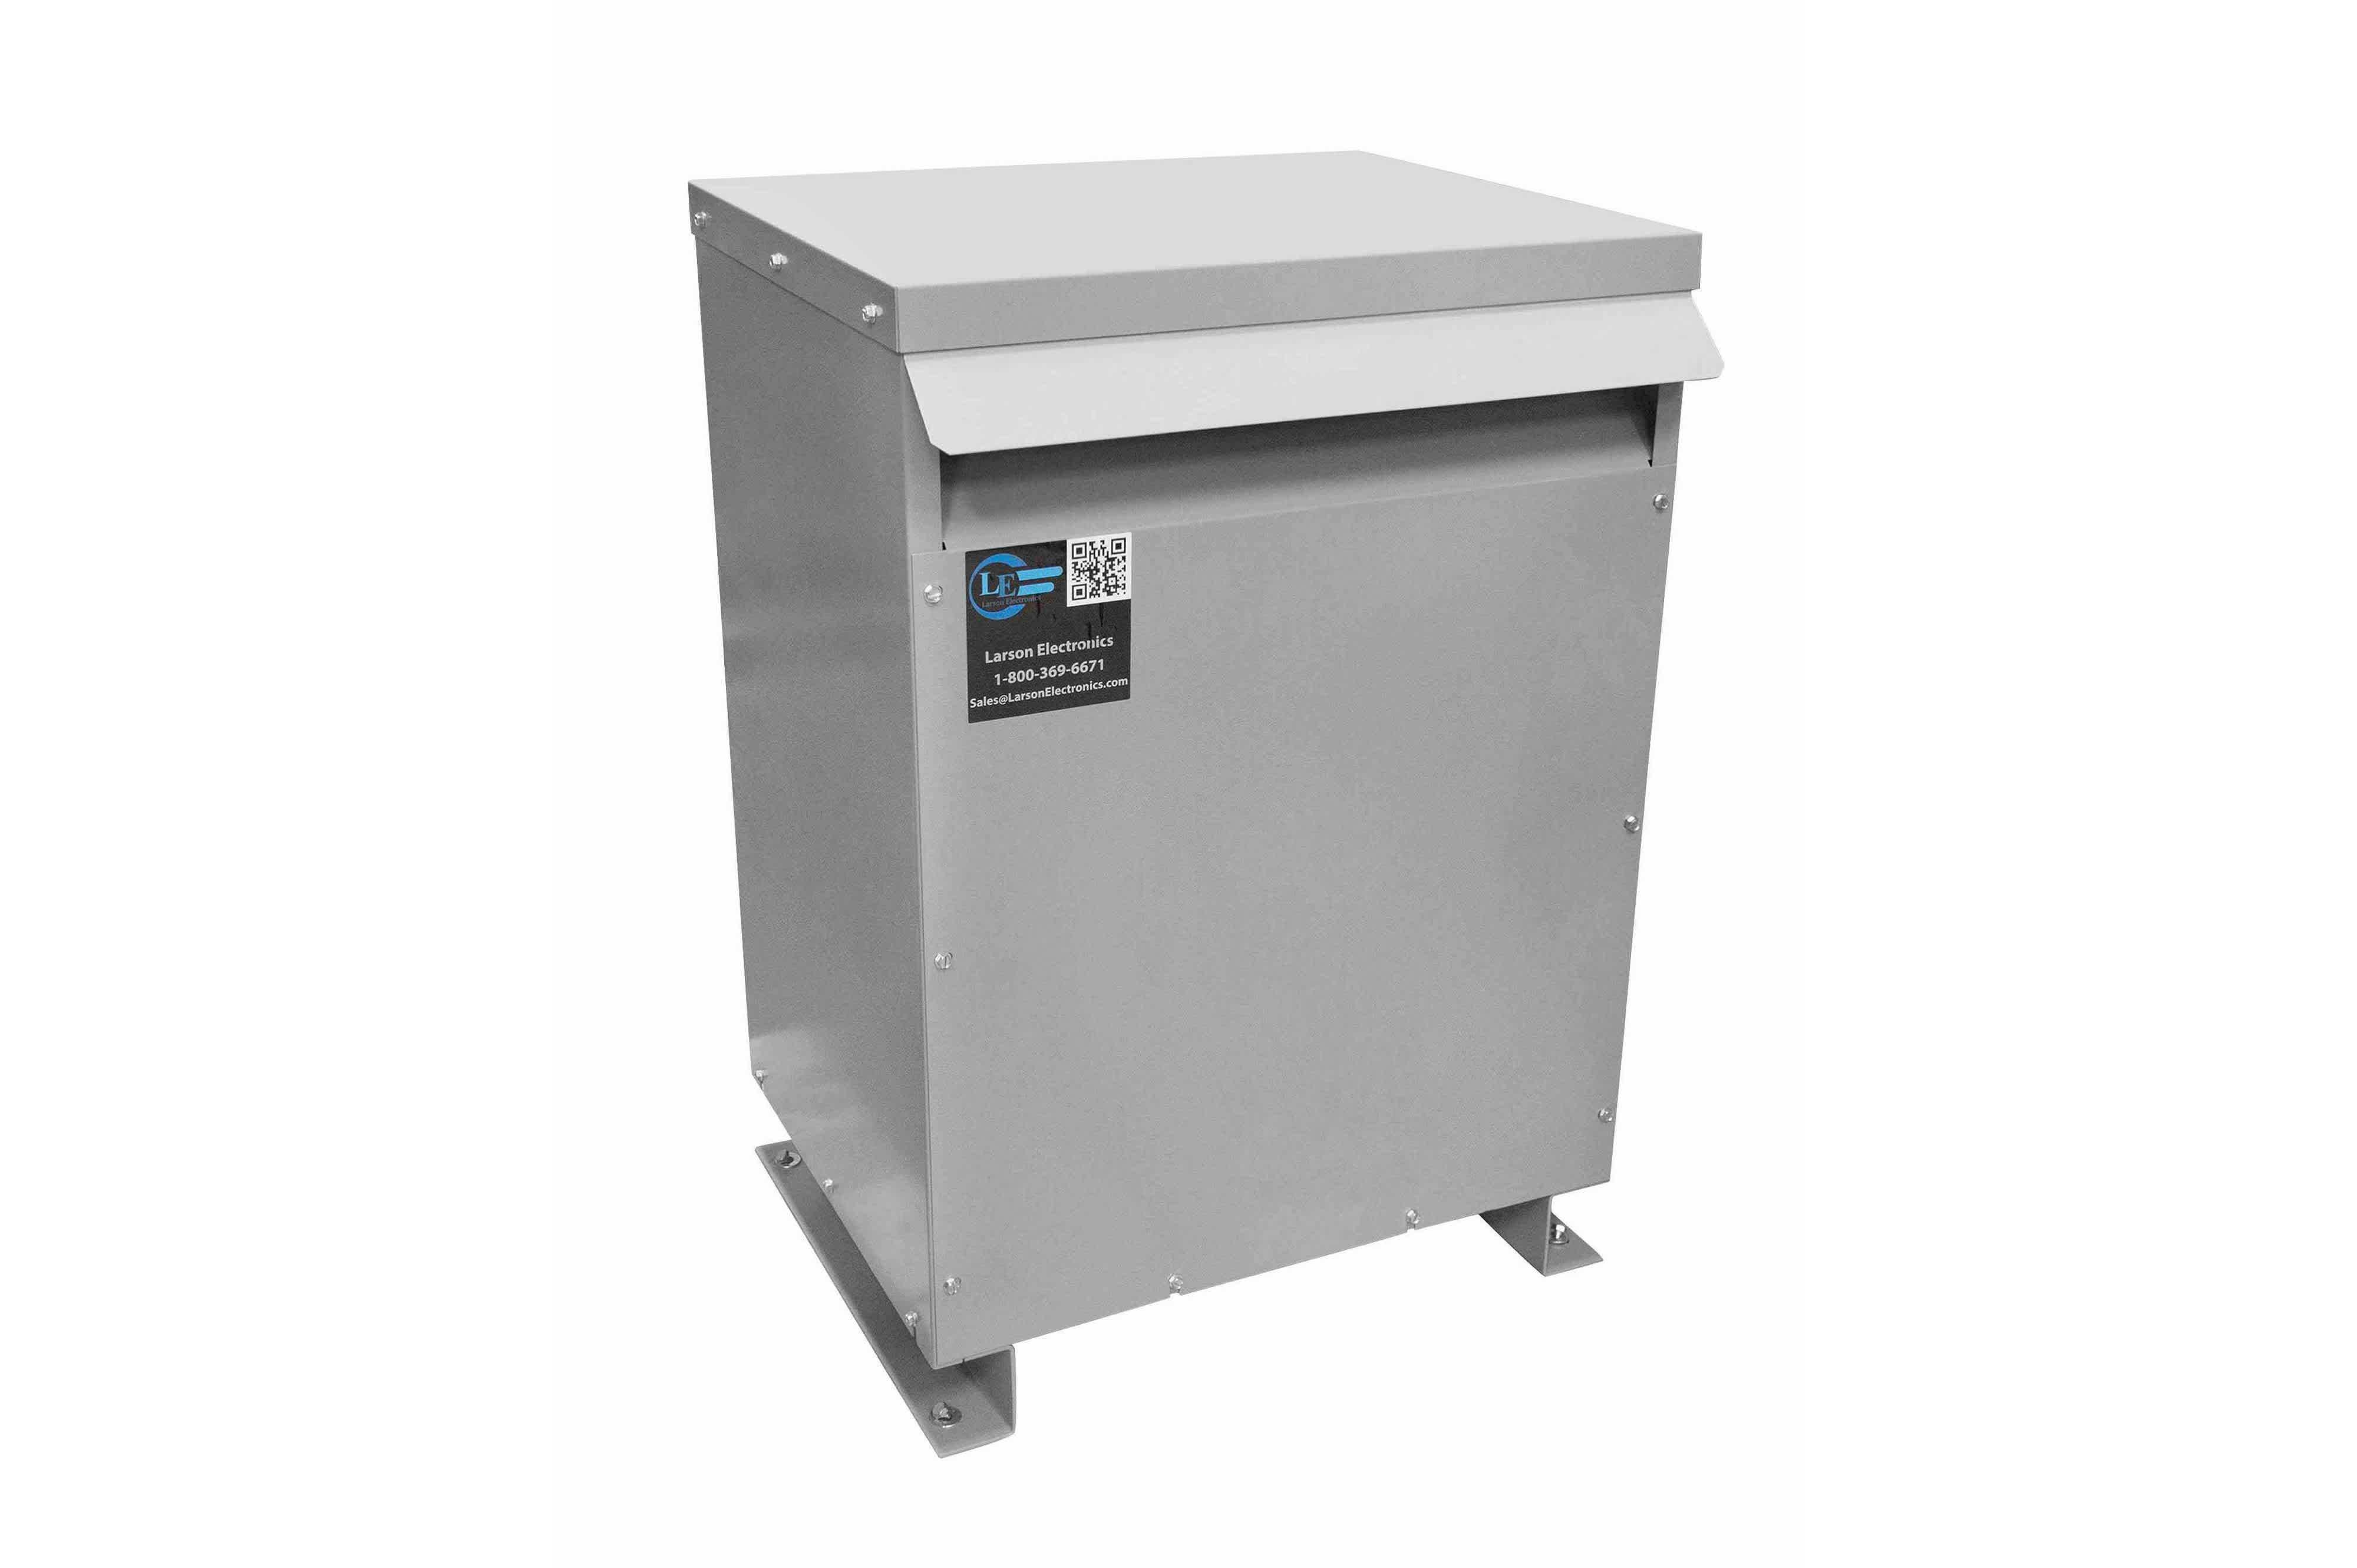 28 kVA 3PH Isolation Transformer, 415V Wye Primary, 240V/120 Delta Secondary, N3R, Ventilated, 60 Hz